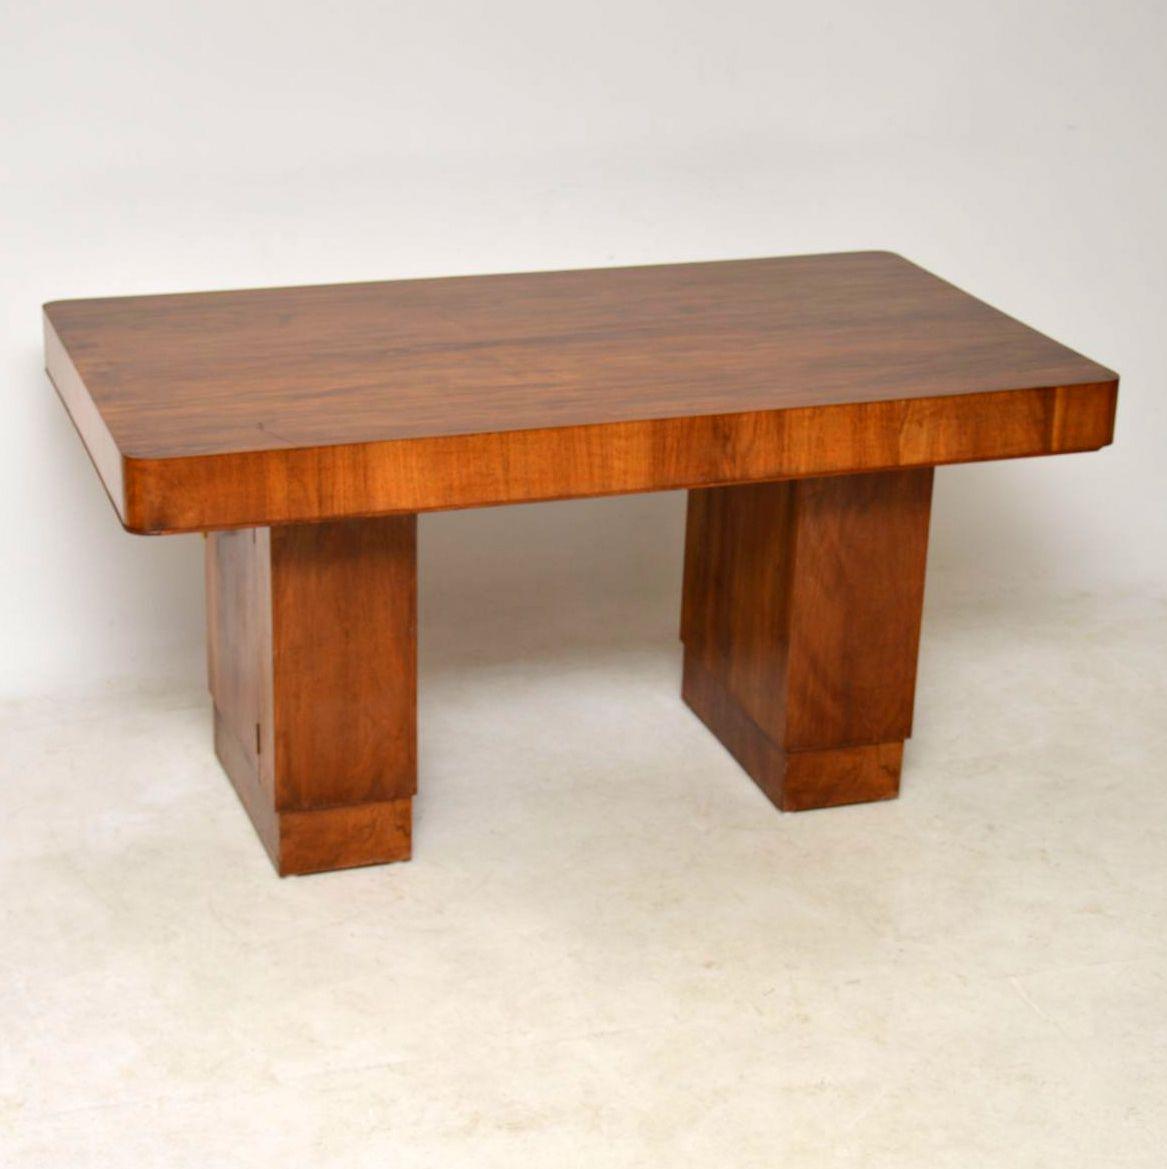 Vintage Art Deco Walnut Pedestal Dining Table